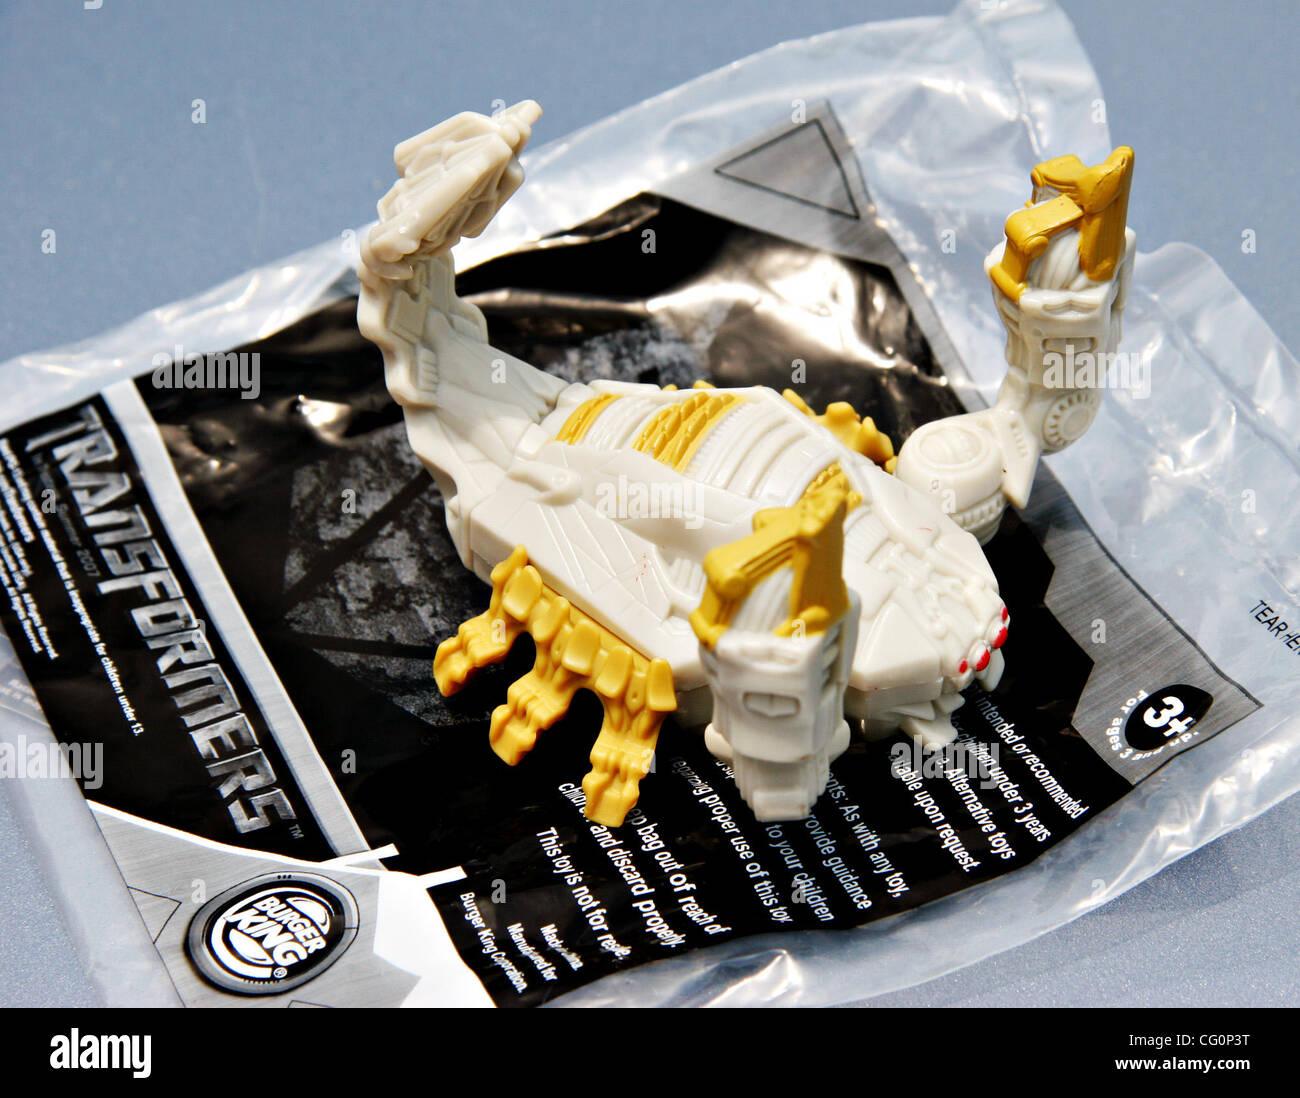 Burger Kings Scorpion Transformer Toy Jay Solmonsontri Valley